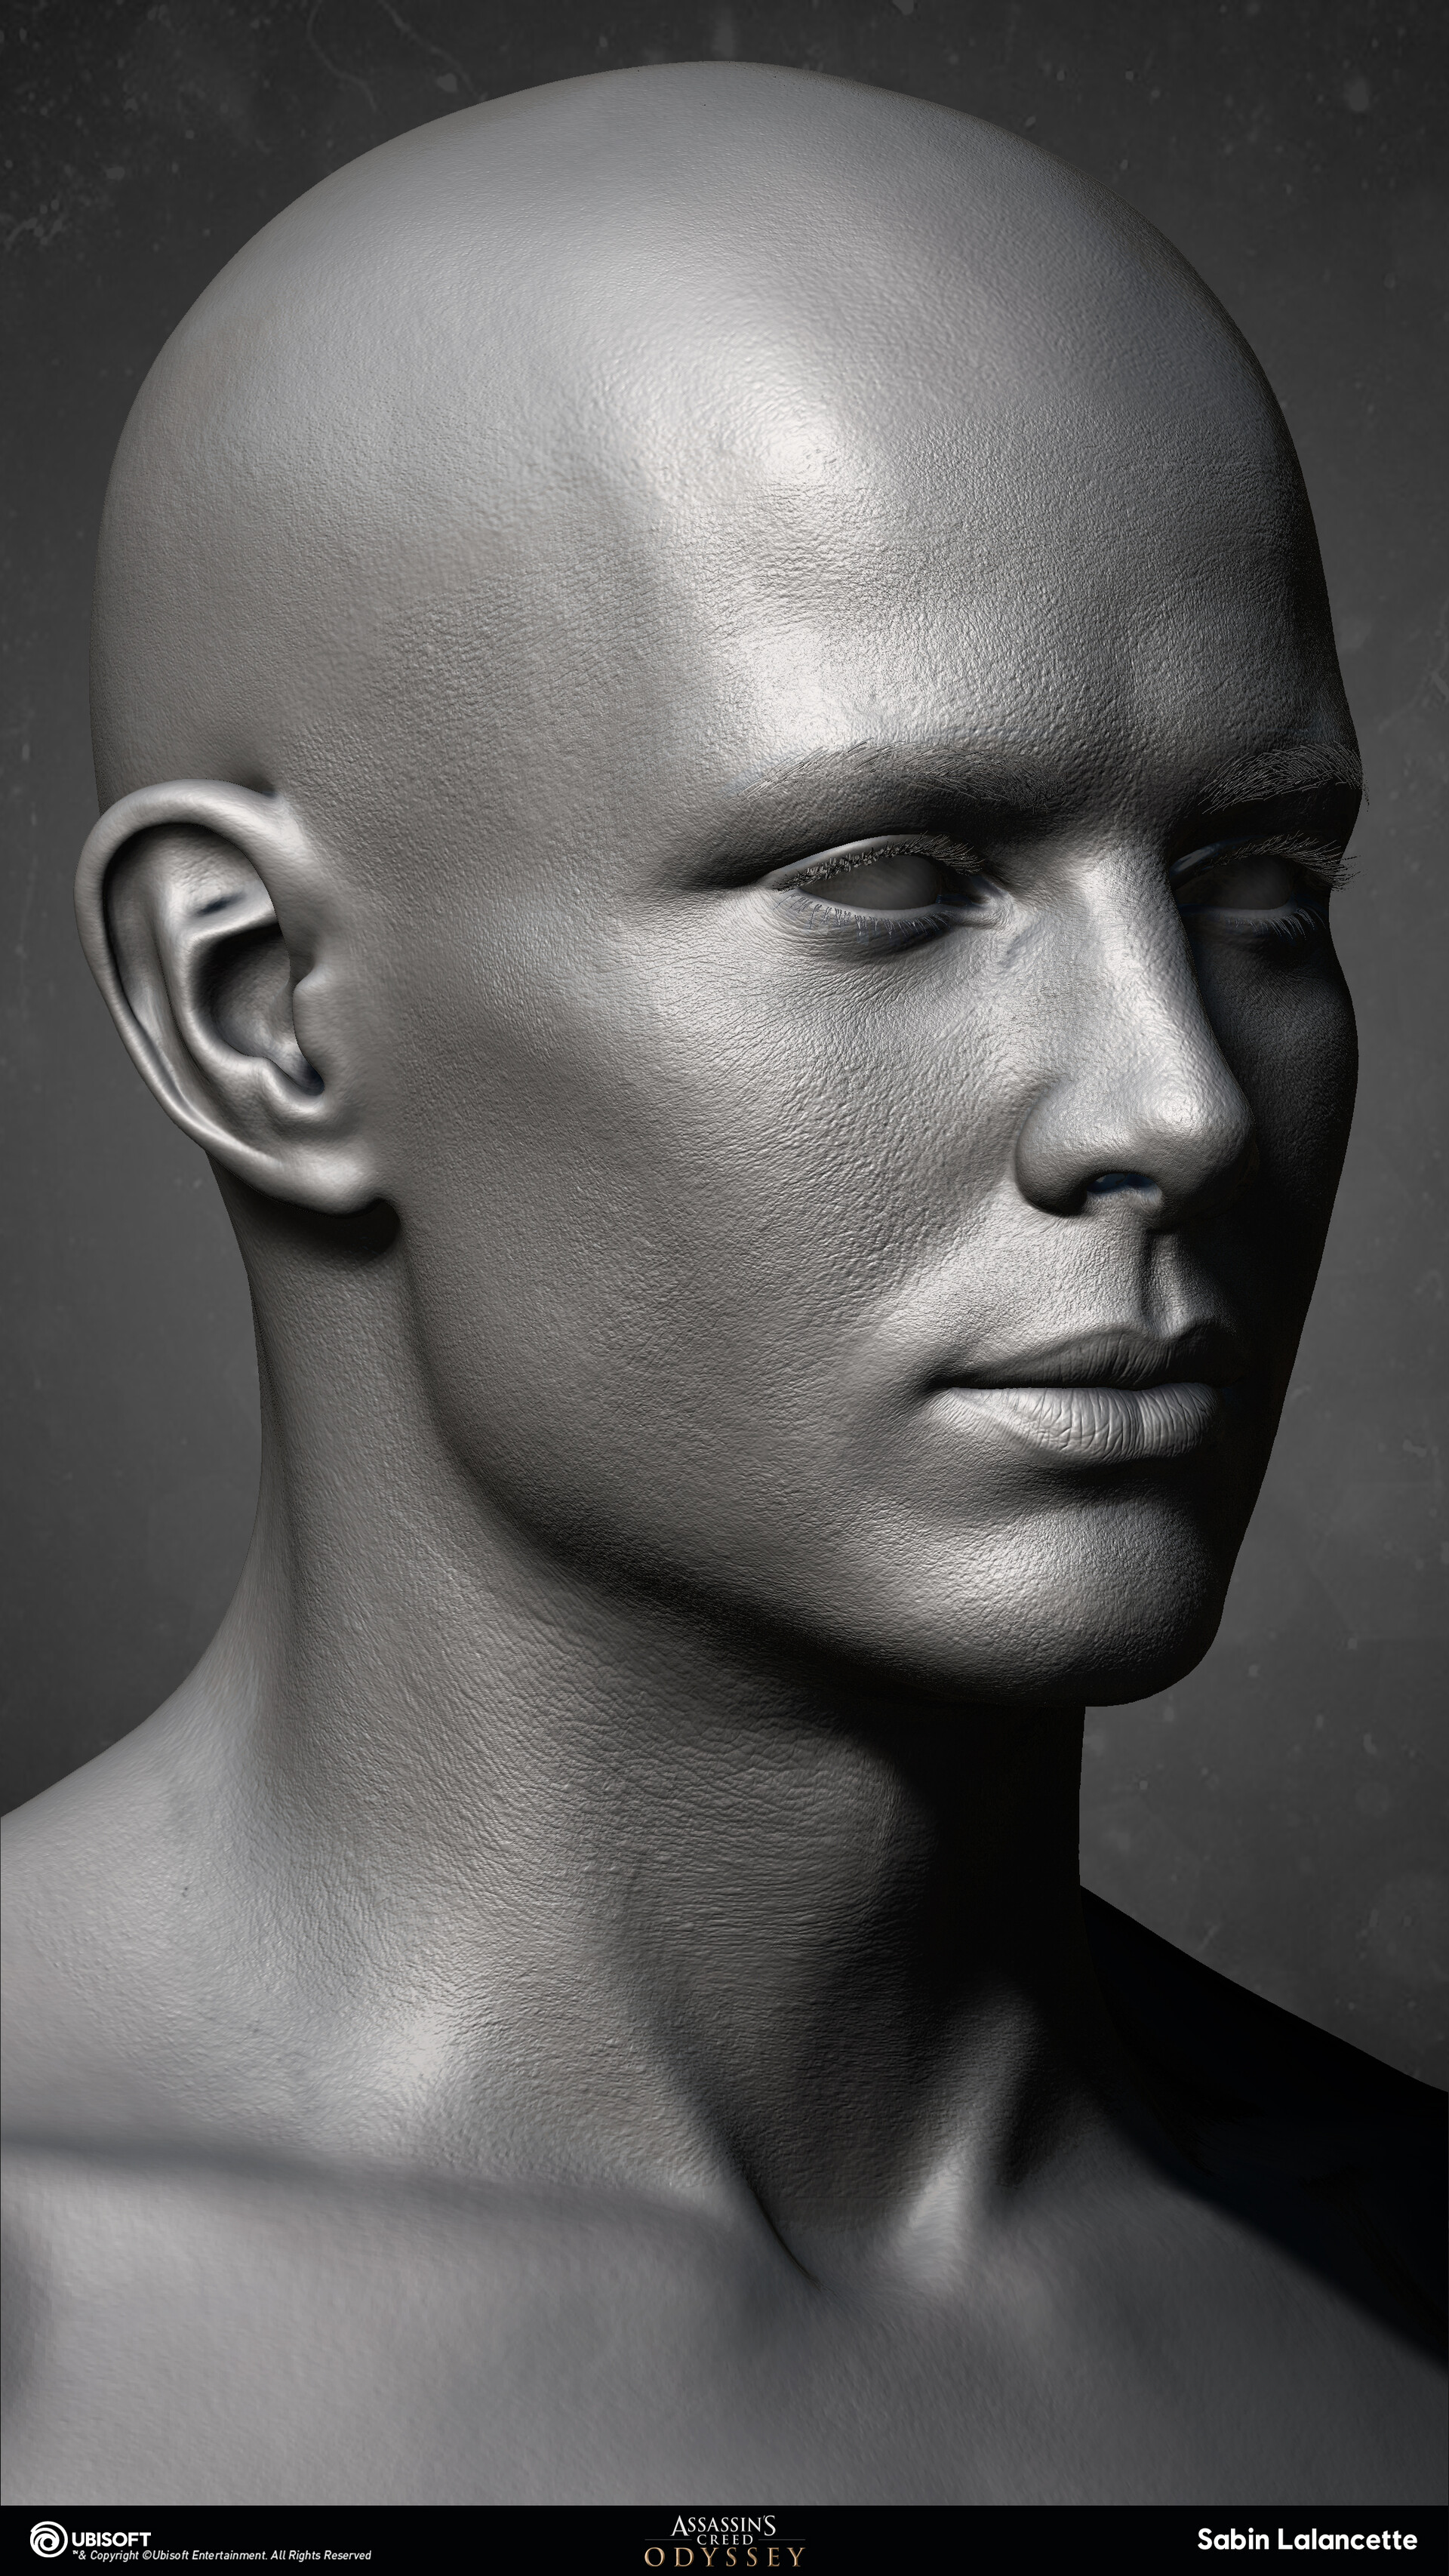 Sabin lalancette artblast fullsizezb head3q hermes slalancette